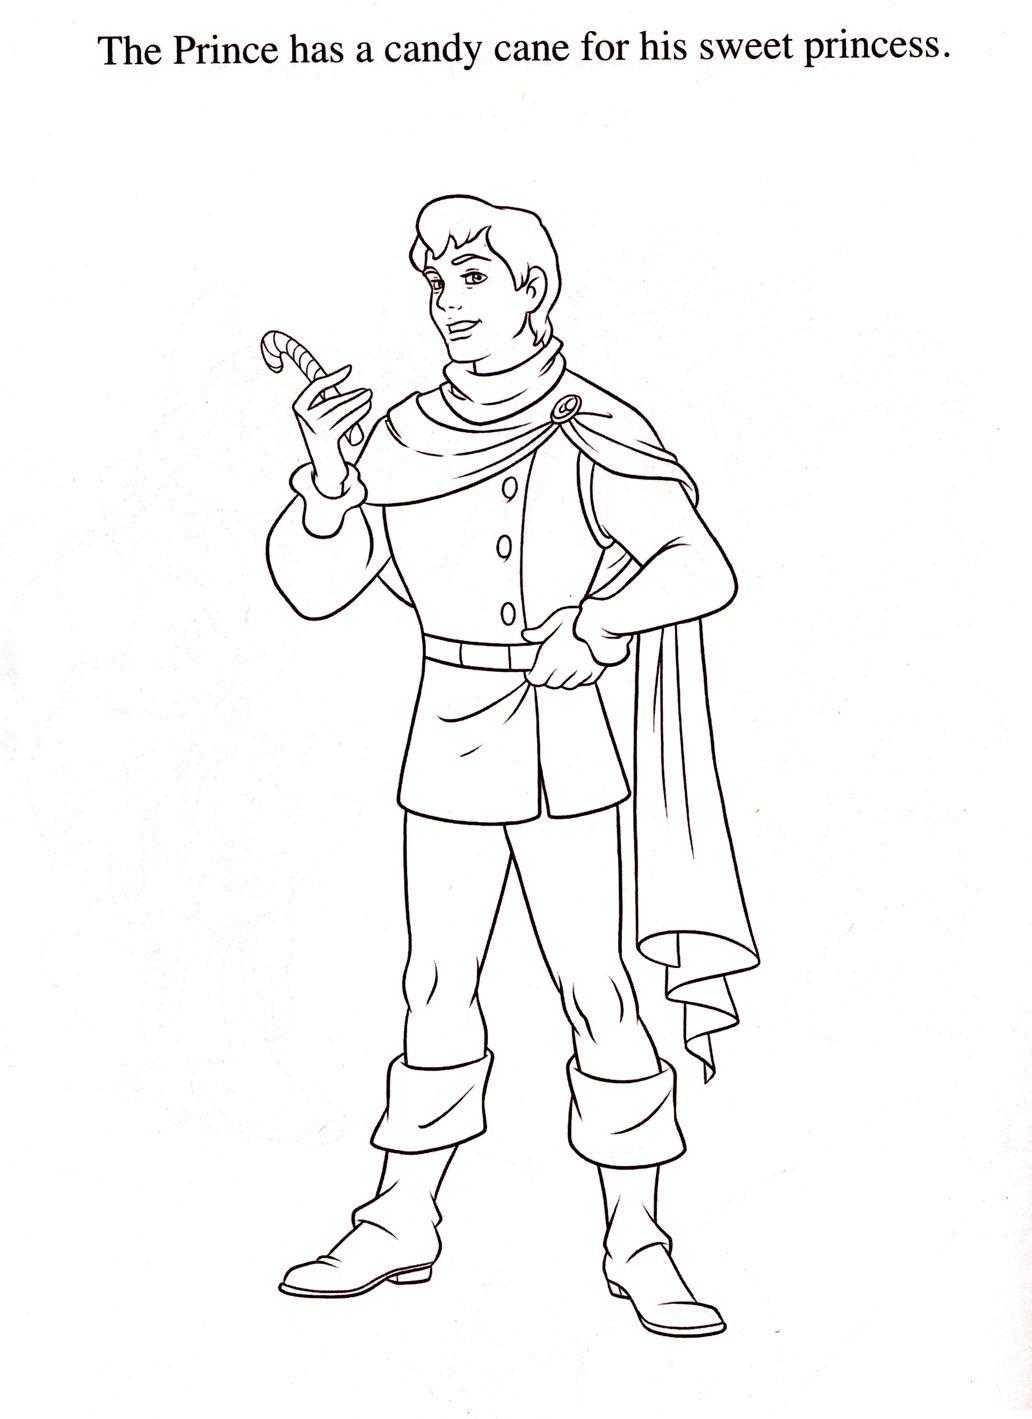 Disney Coloring Pages | Disney coloring pages, Coloring ...